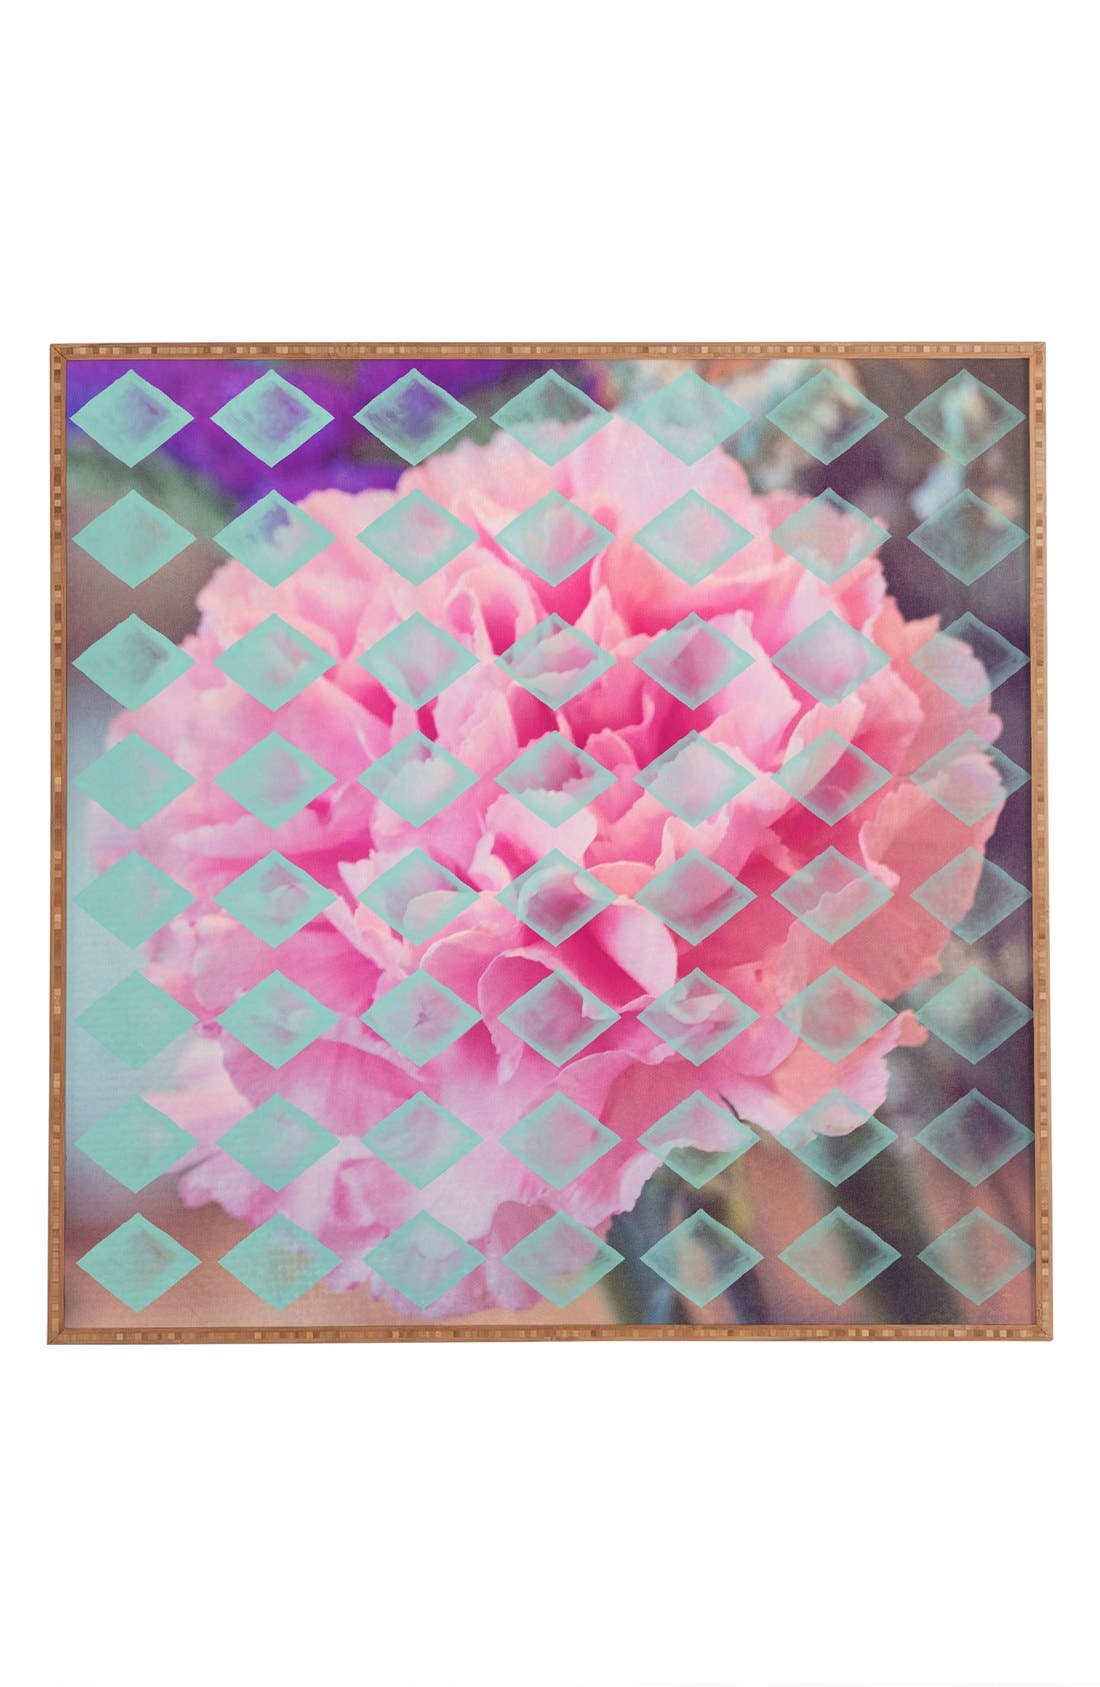 DENY DESIGNS 'Floral Diamonds' Framed Wall Art